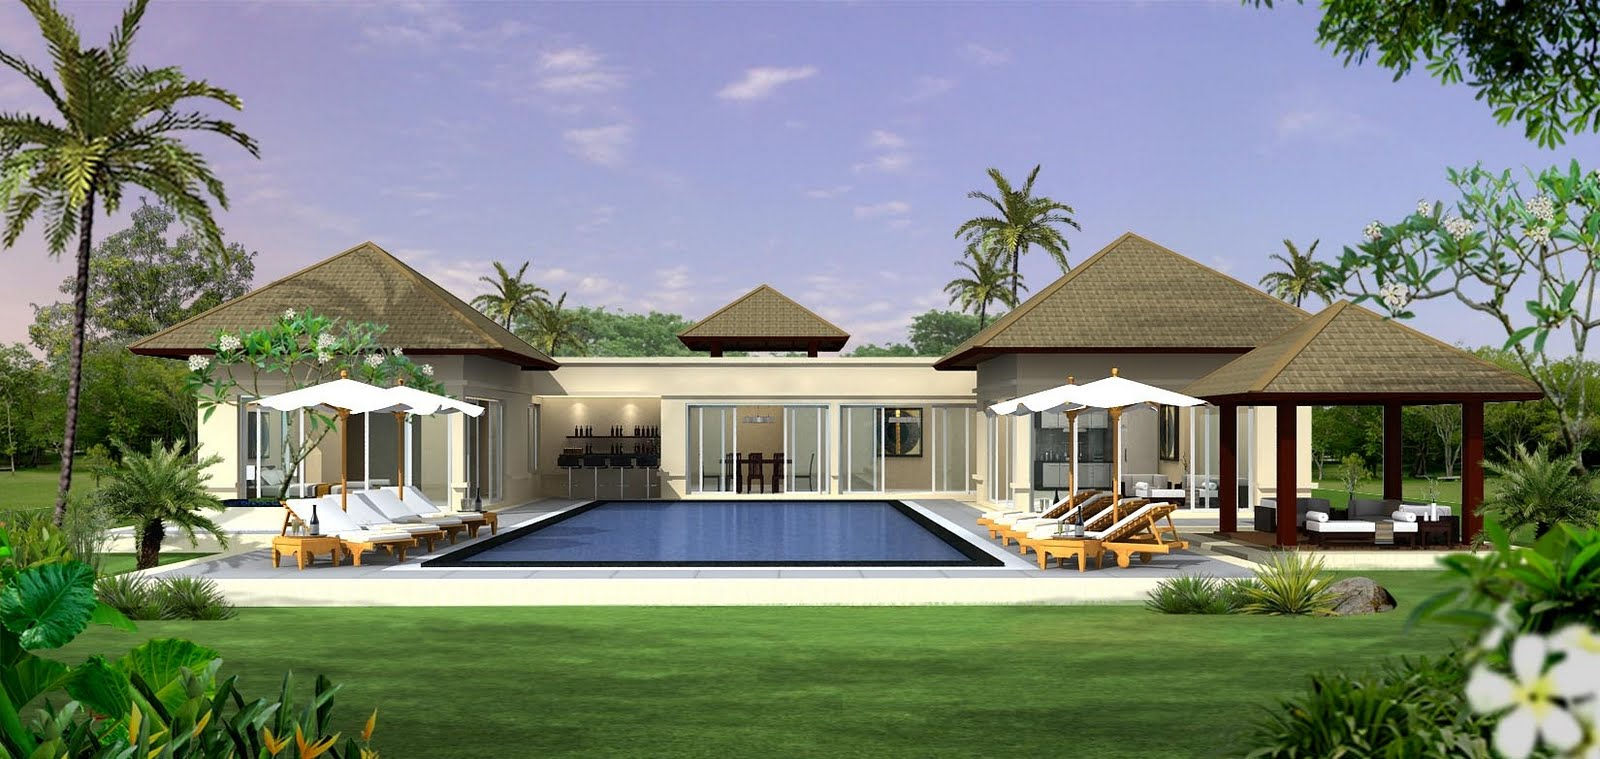 10 contoh desain villa tropis jurnal arsitektur for Casa moderna l